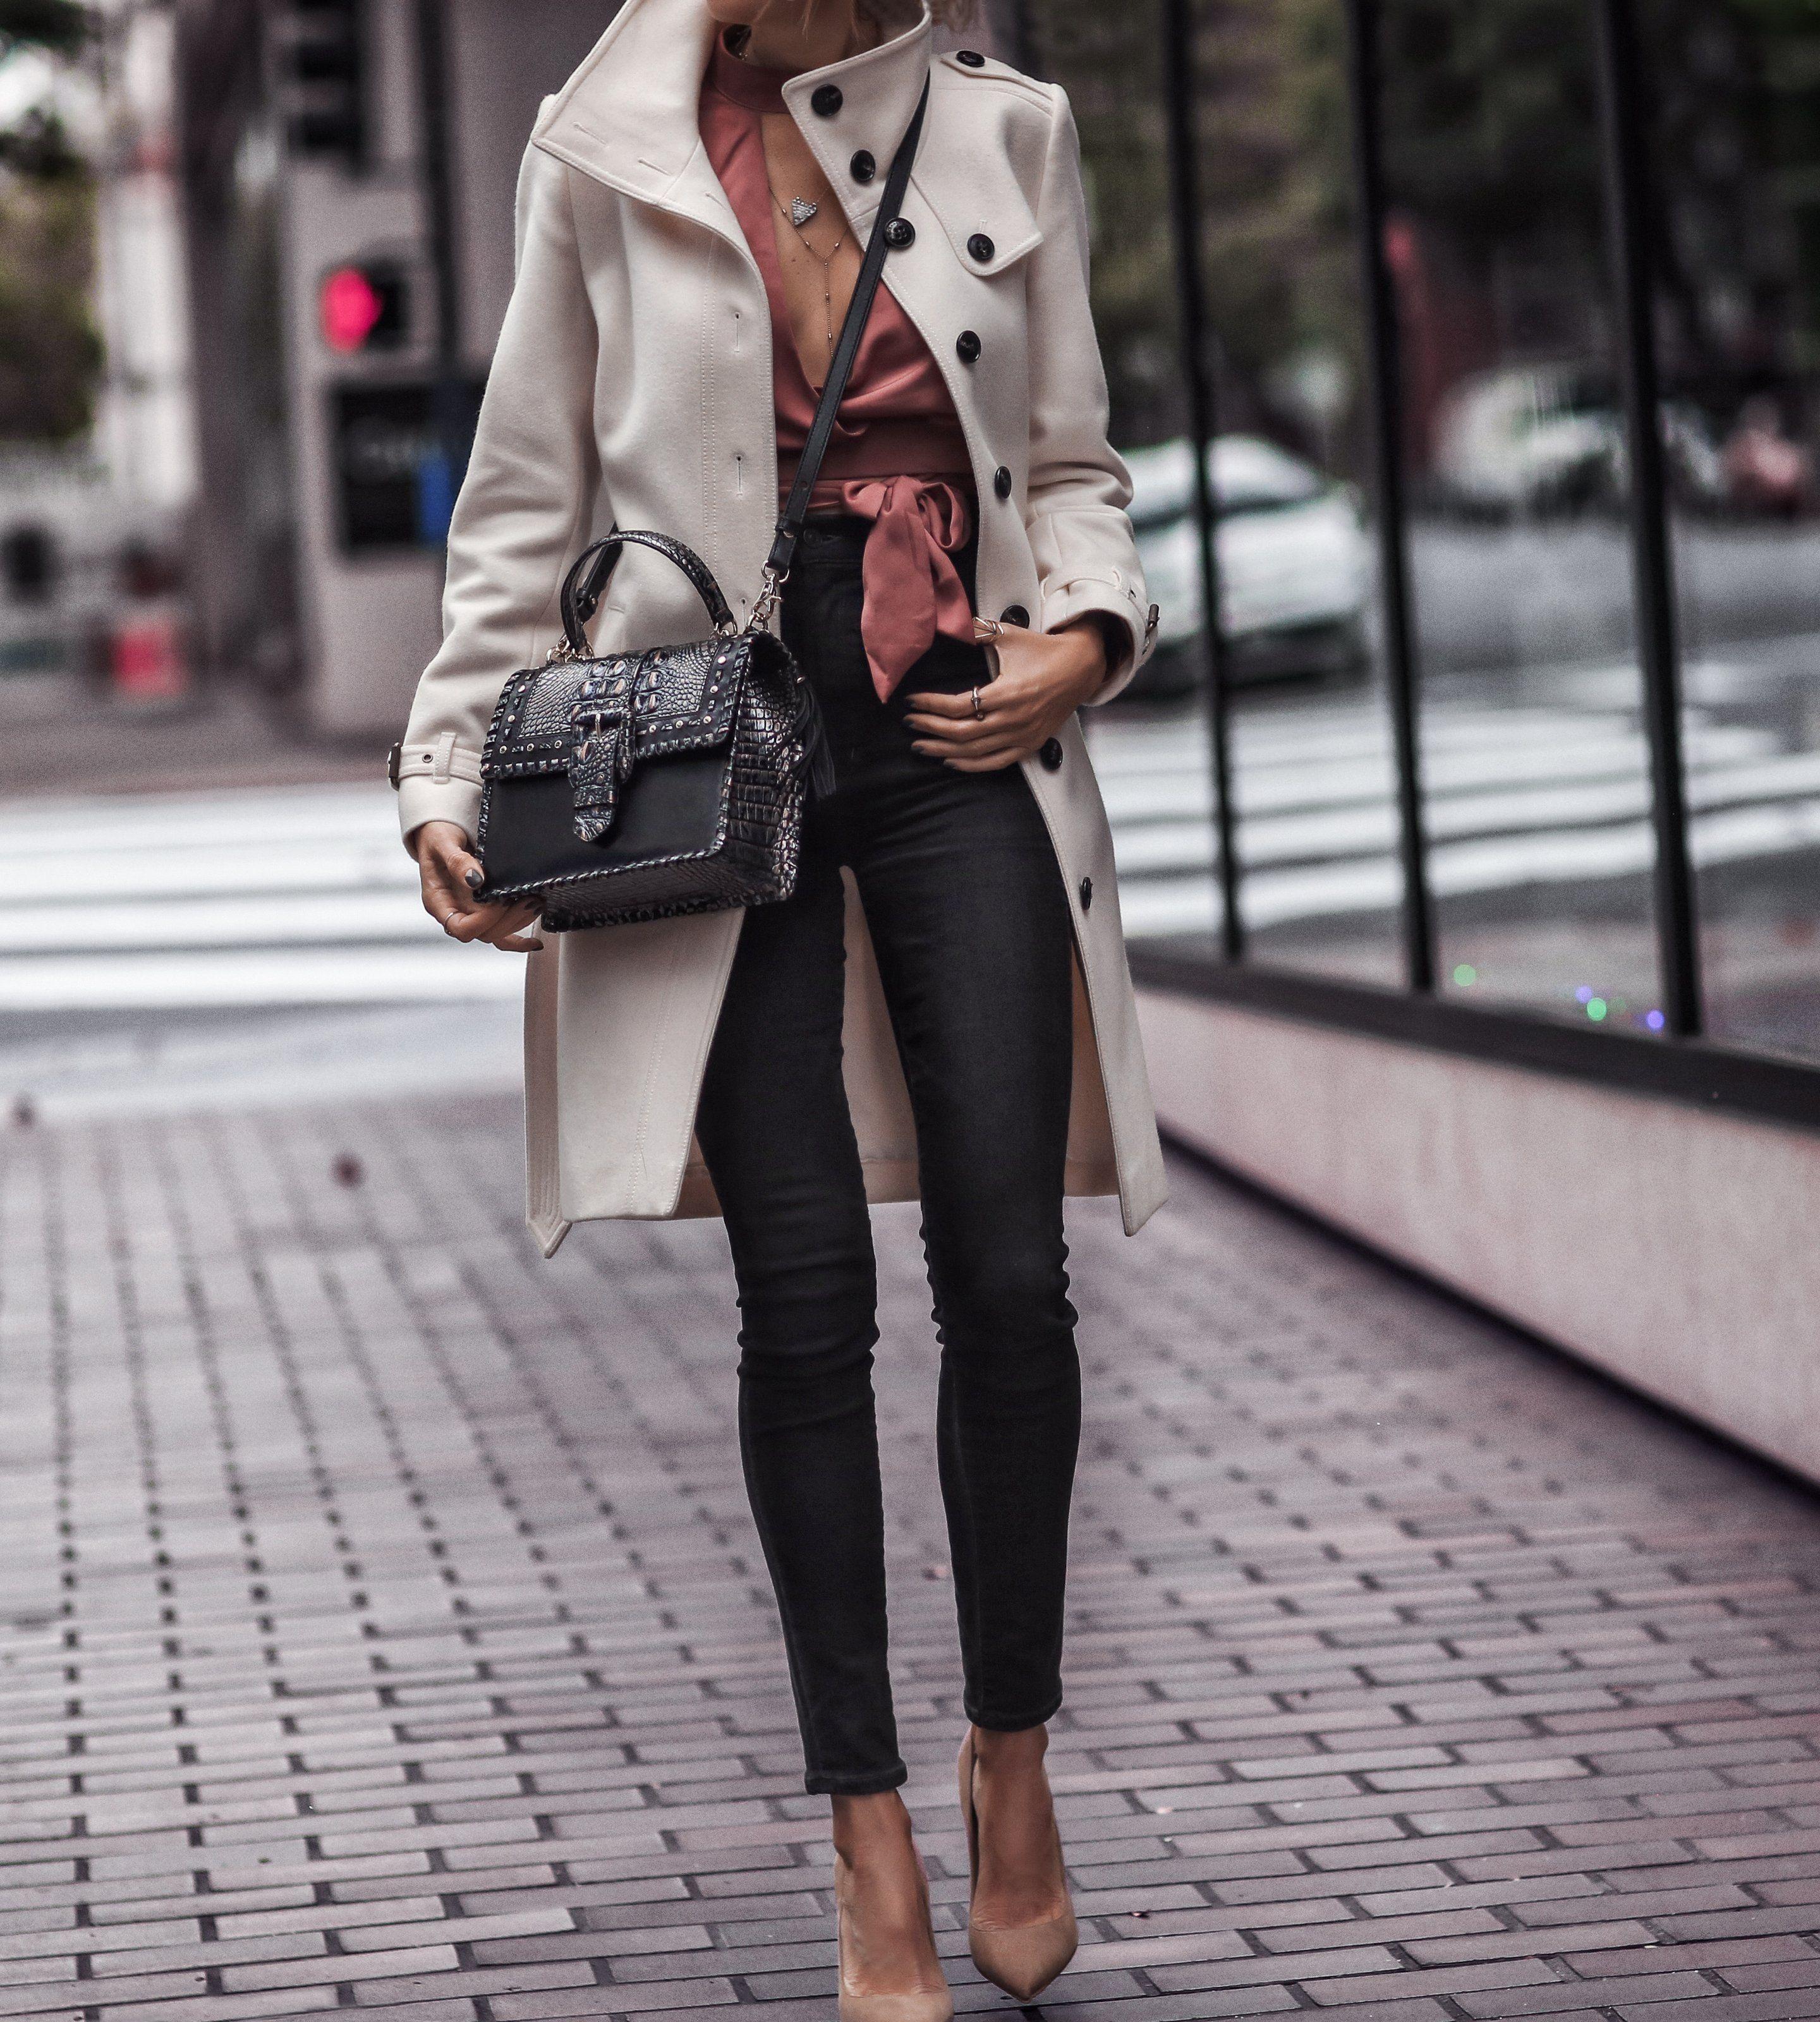 U-Healthy Winter 97/% cashmere wool women legging pants warm comfort casual vogue